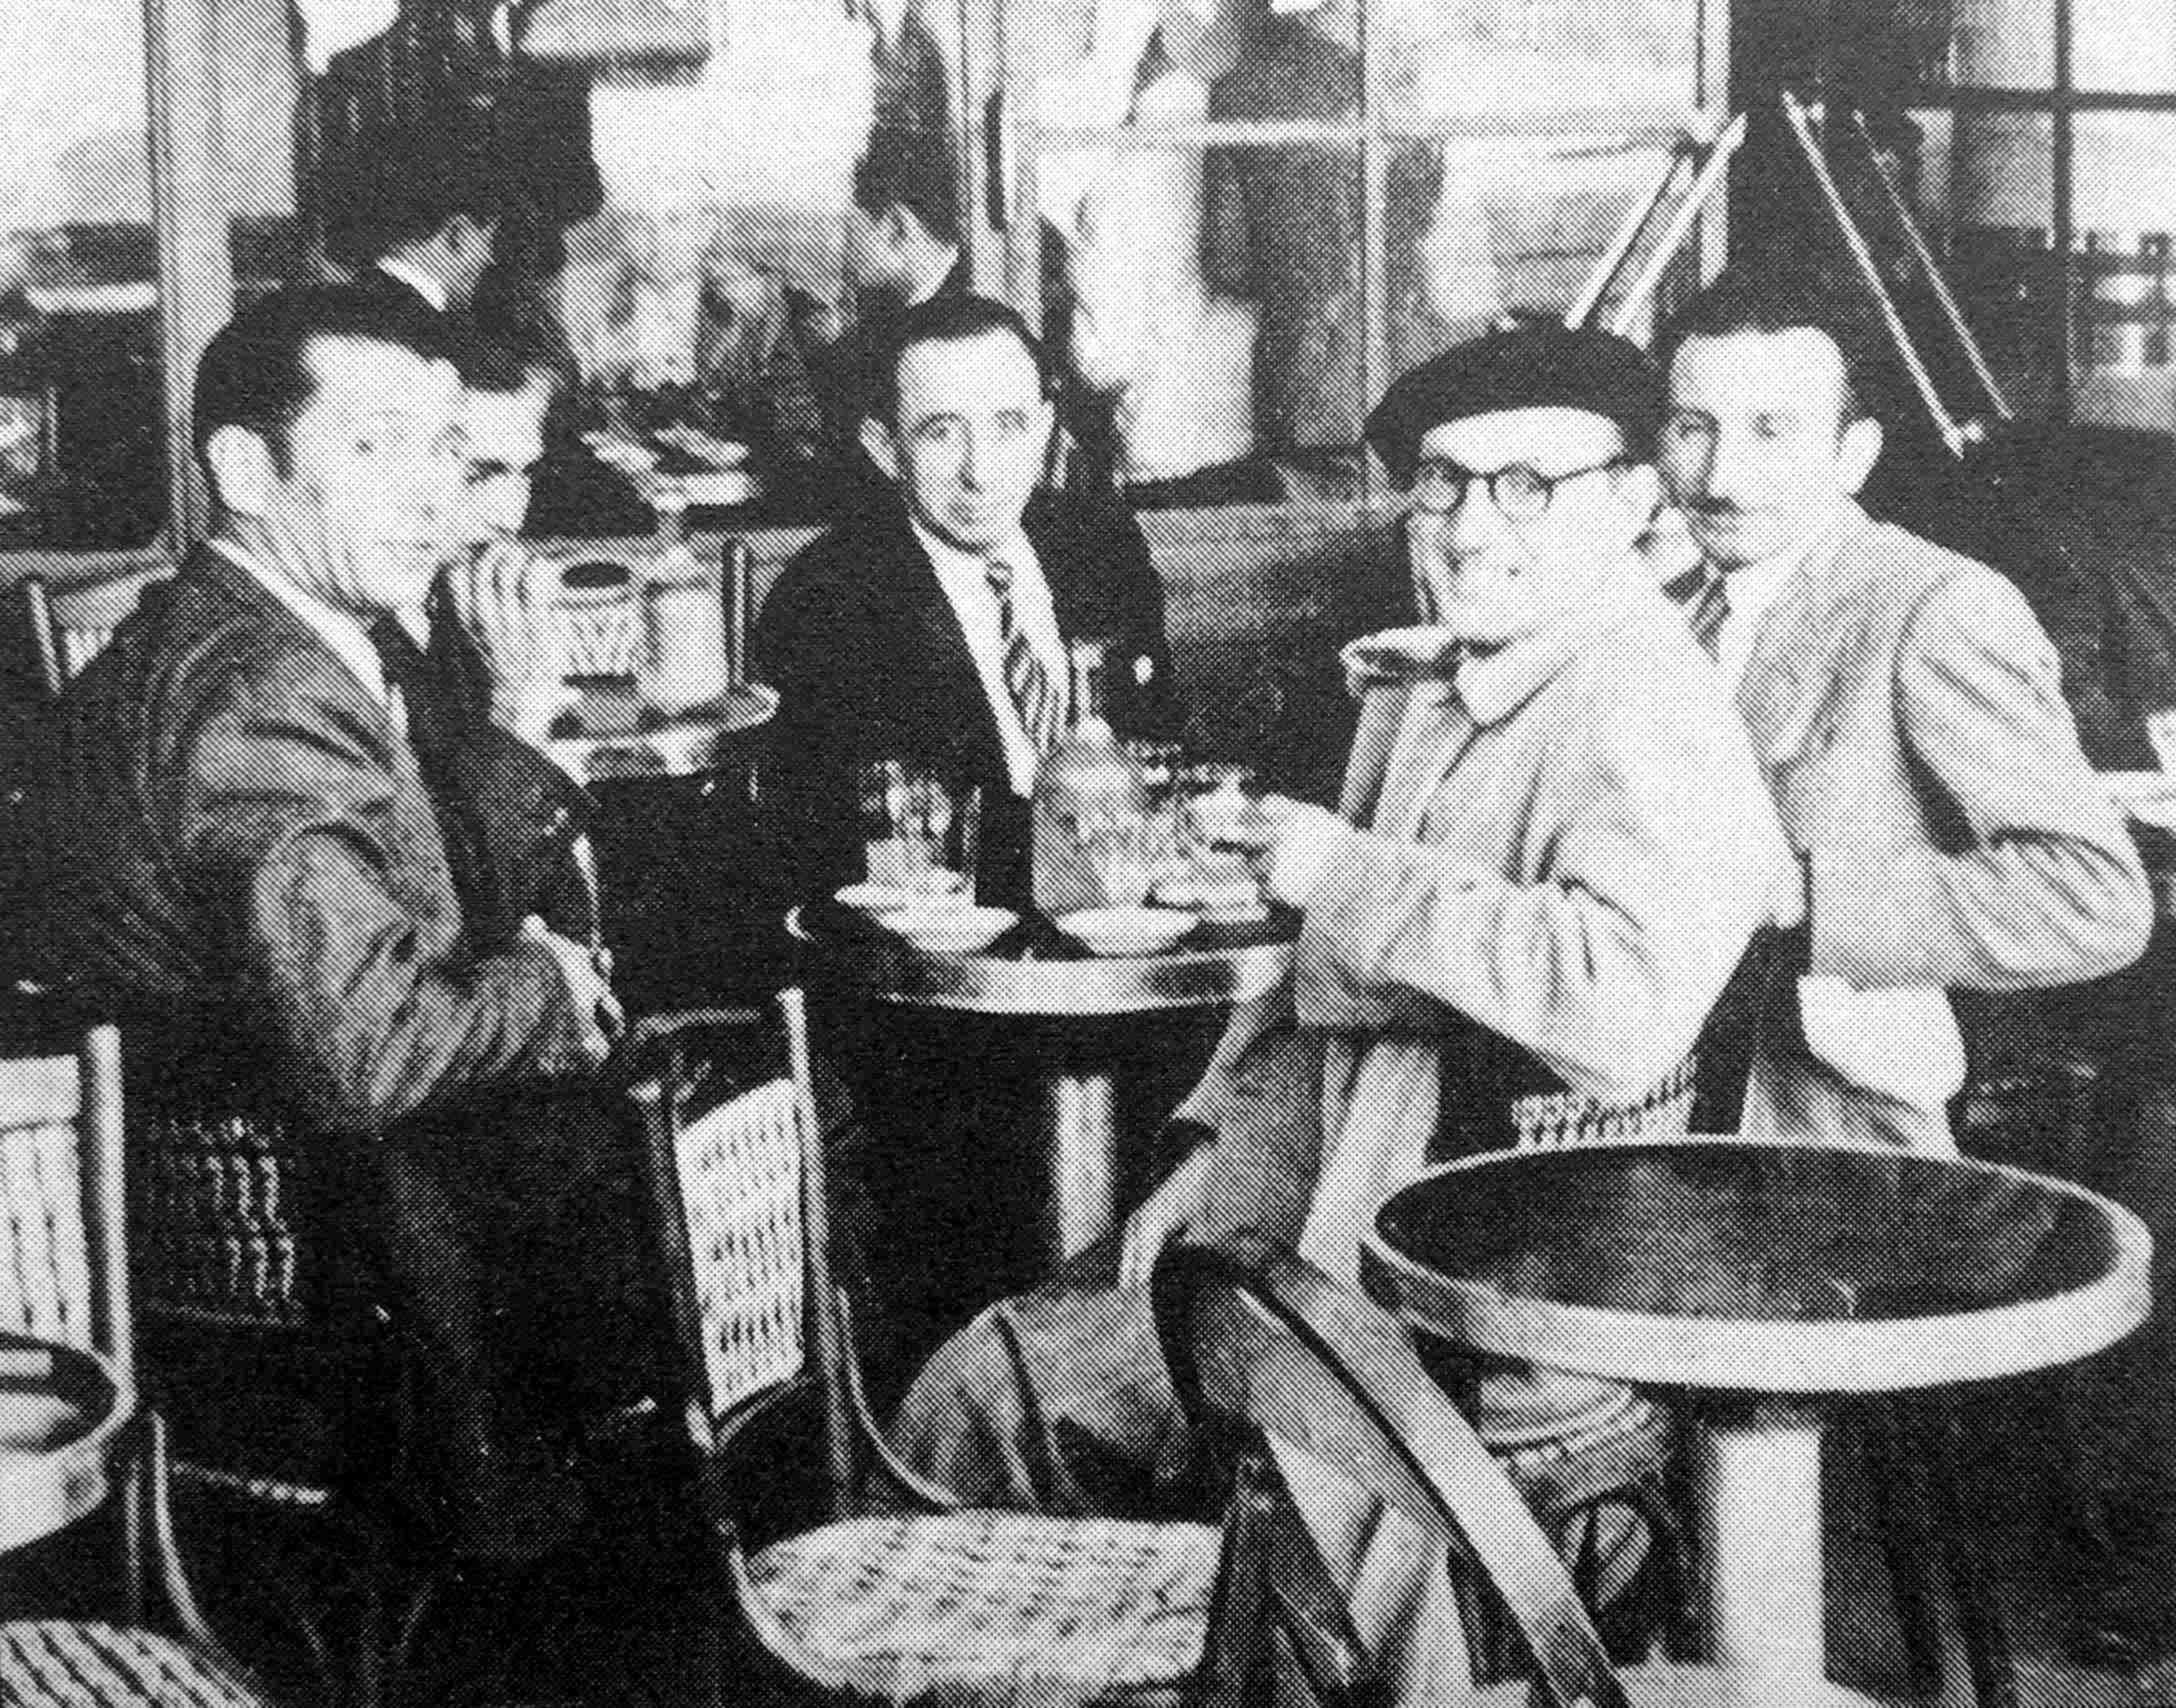 D'esquerra a dreta: José Pérez Ibáñez, Jacinto Santaflorentina, Josep Pujol Grua i Antonio Ortiz Ramírez (Tolosa, 1949)